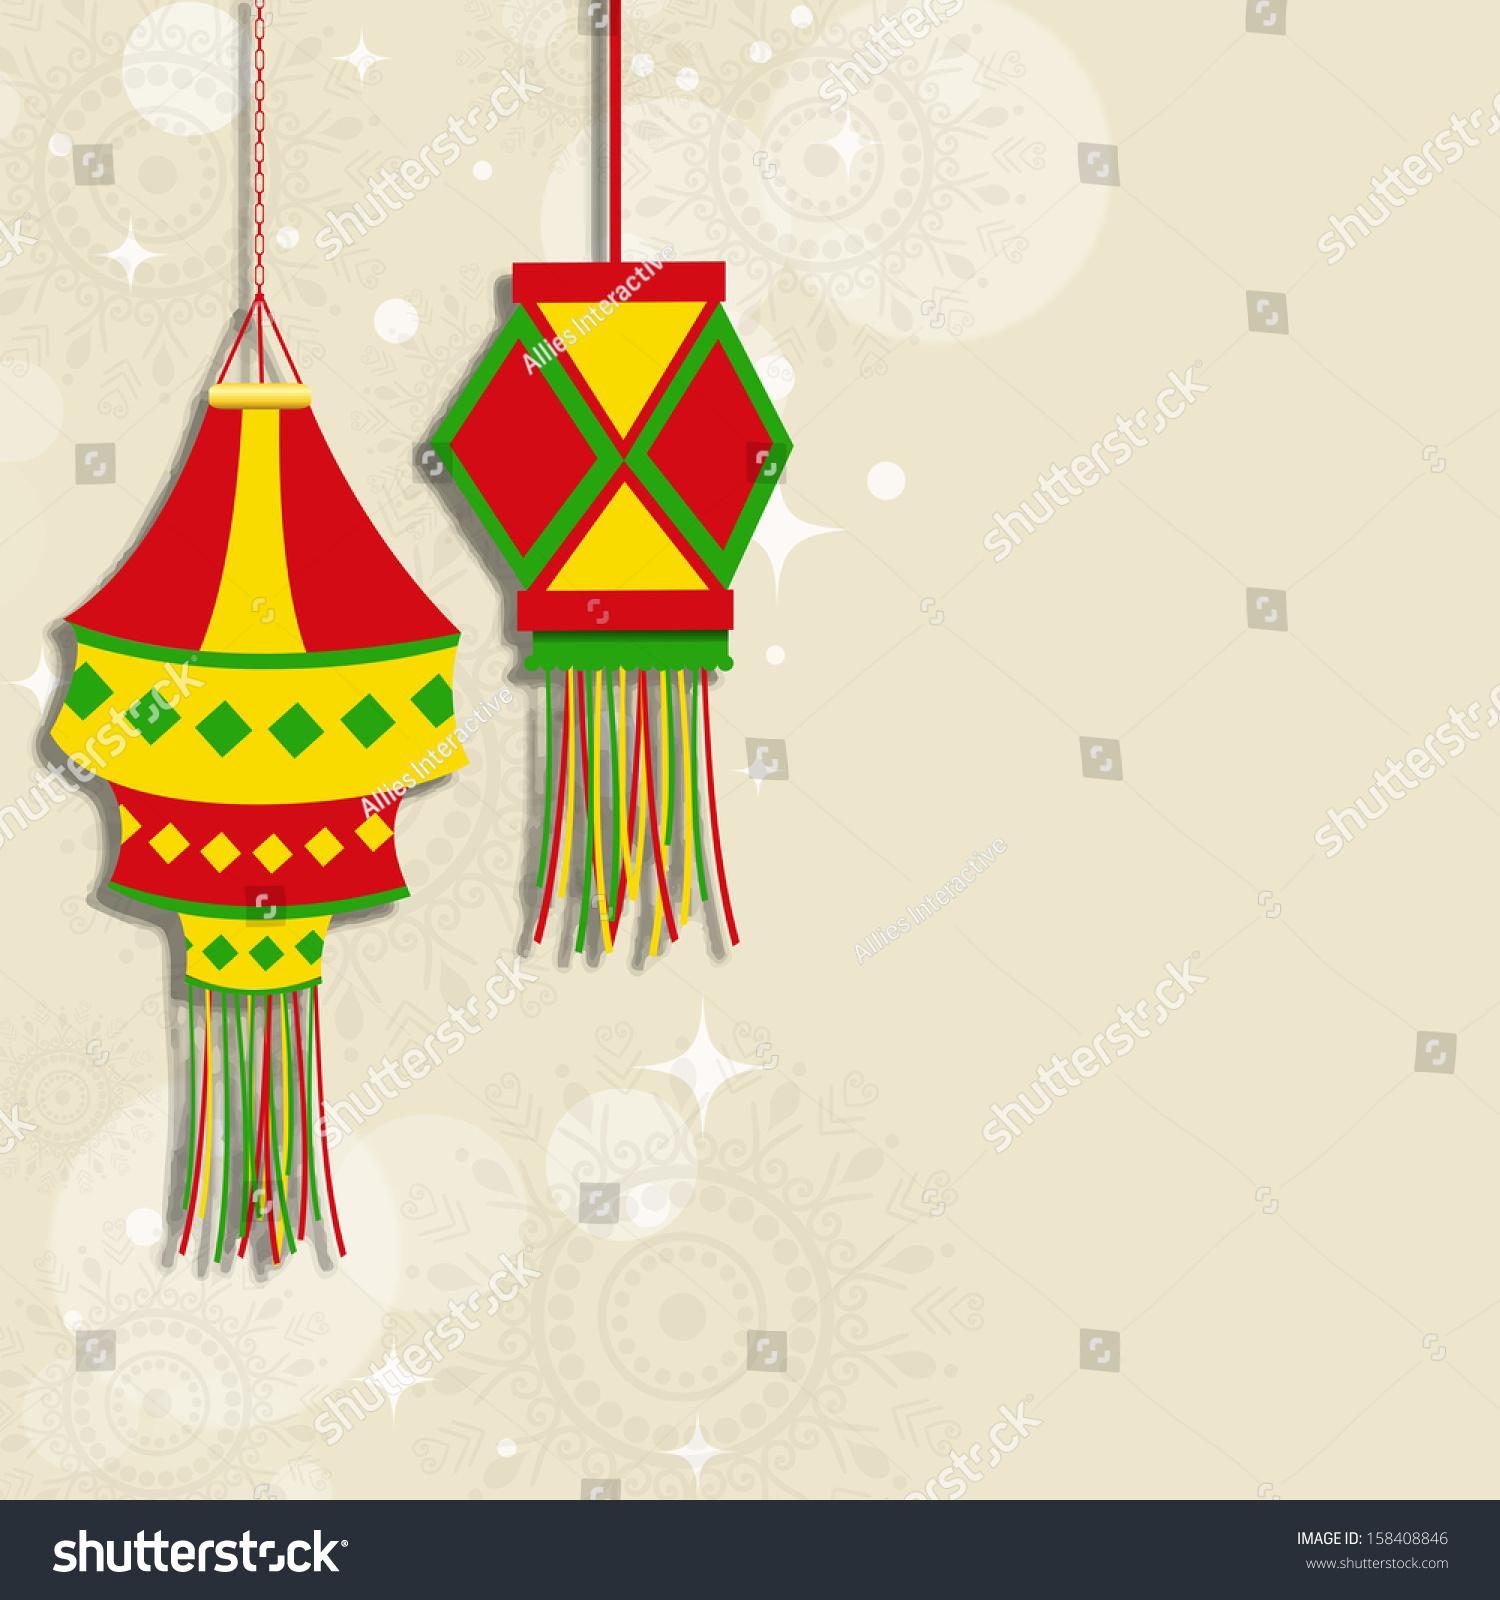 Indian Festival Lights Happy Diwali Concept Stock Vector (Royalty ...